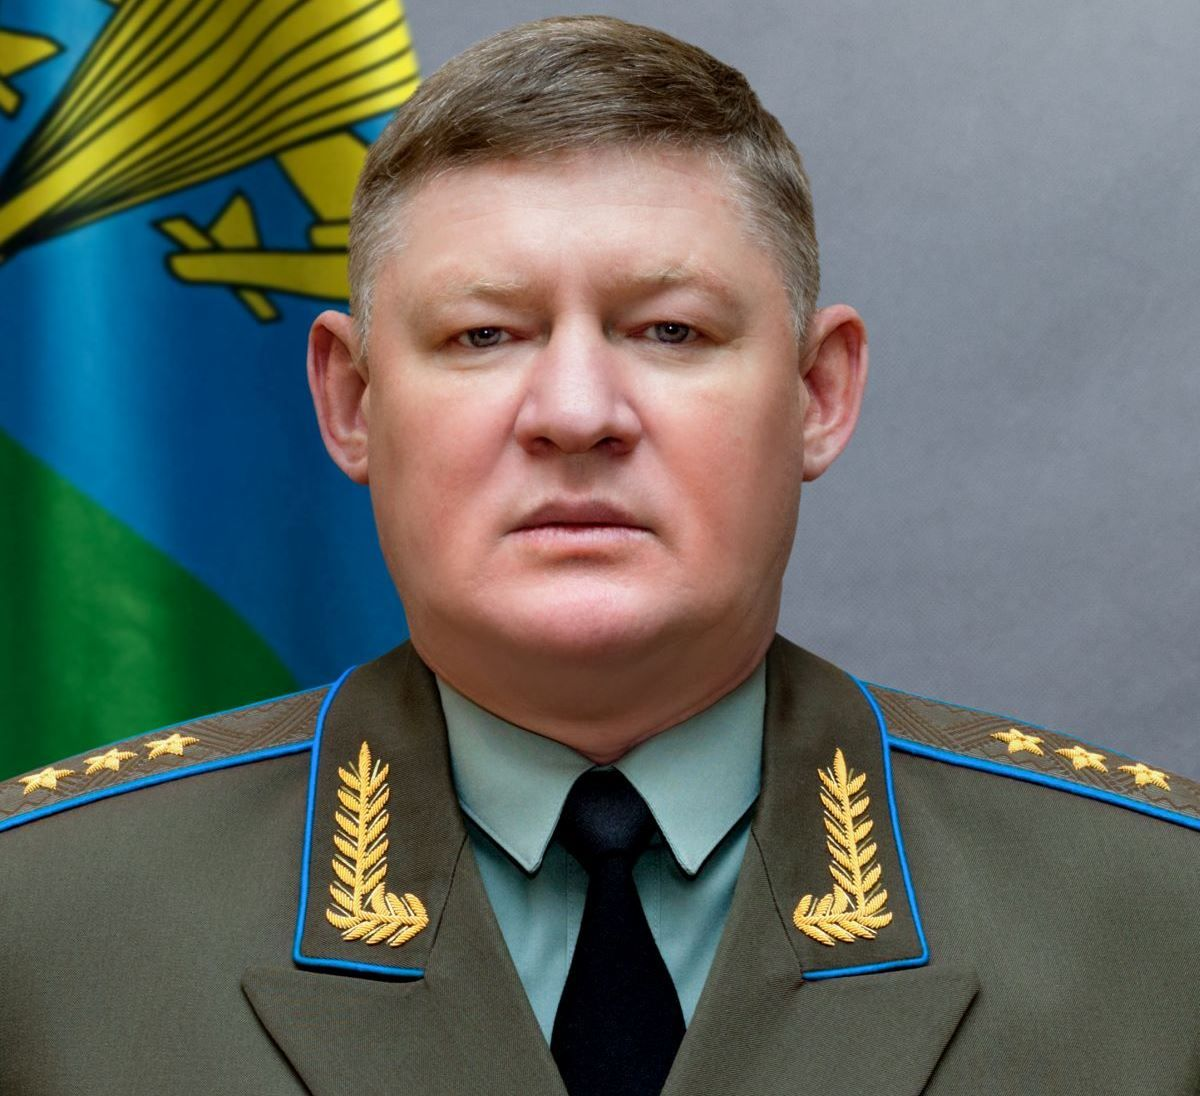 Сердюков руководил захватом Крыма / фото mil.ru